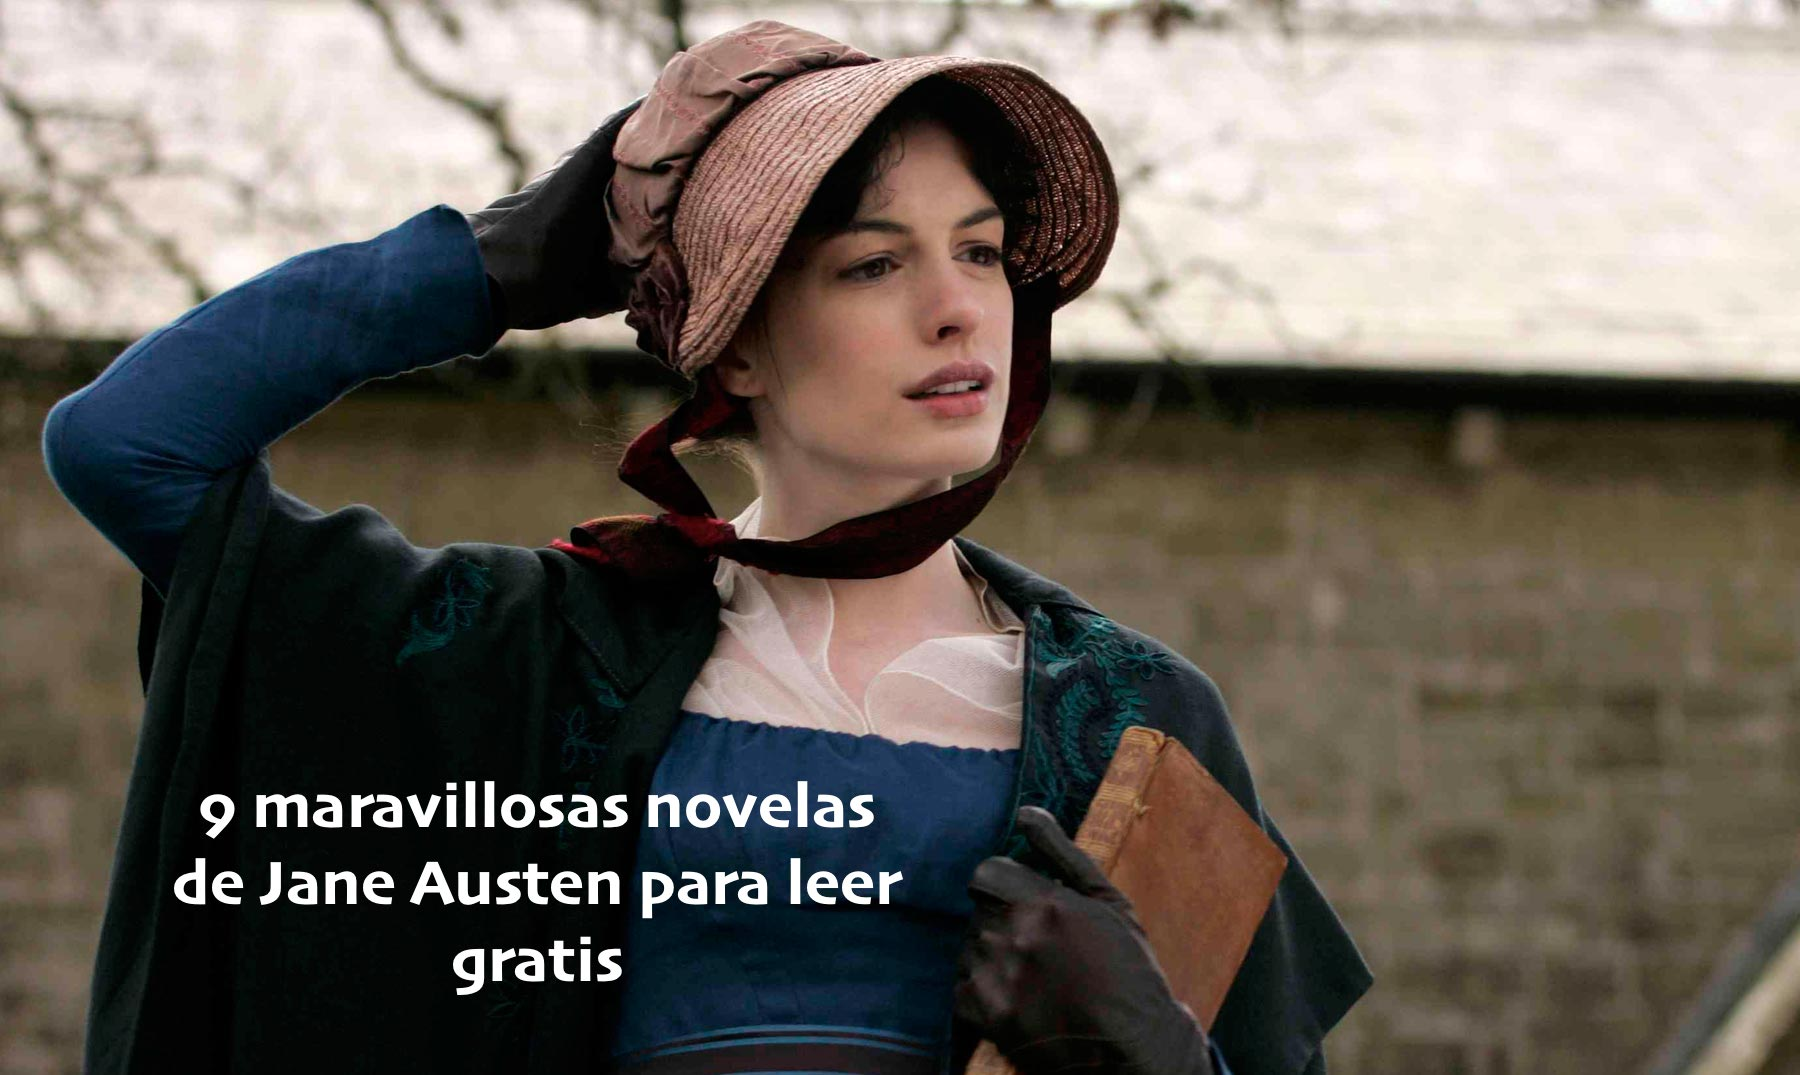 9 maravillosas novelas de Jane Austen para leer gratis